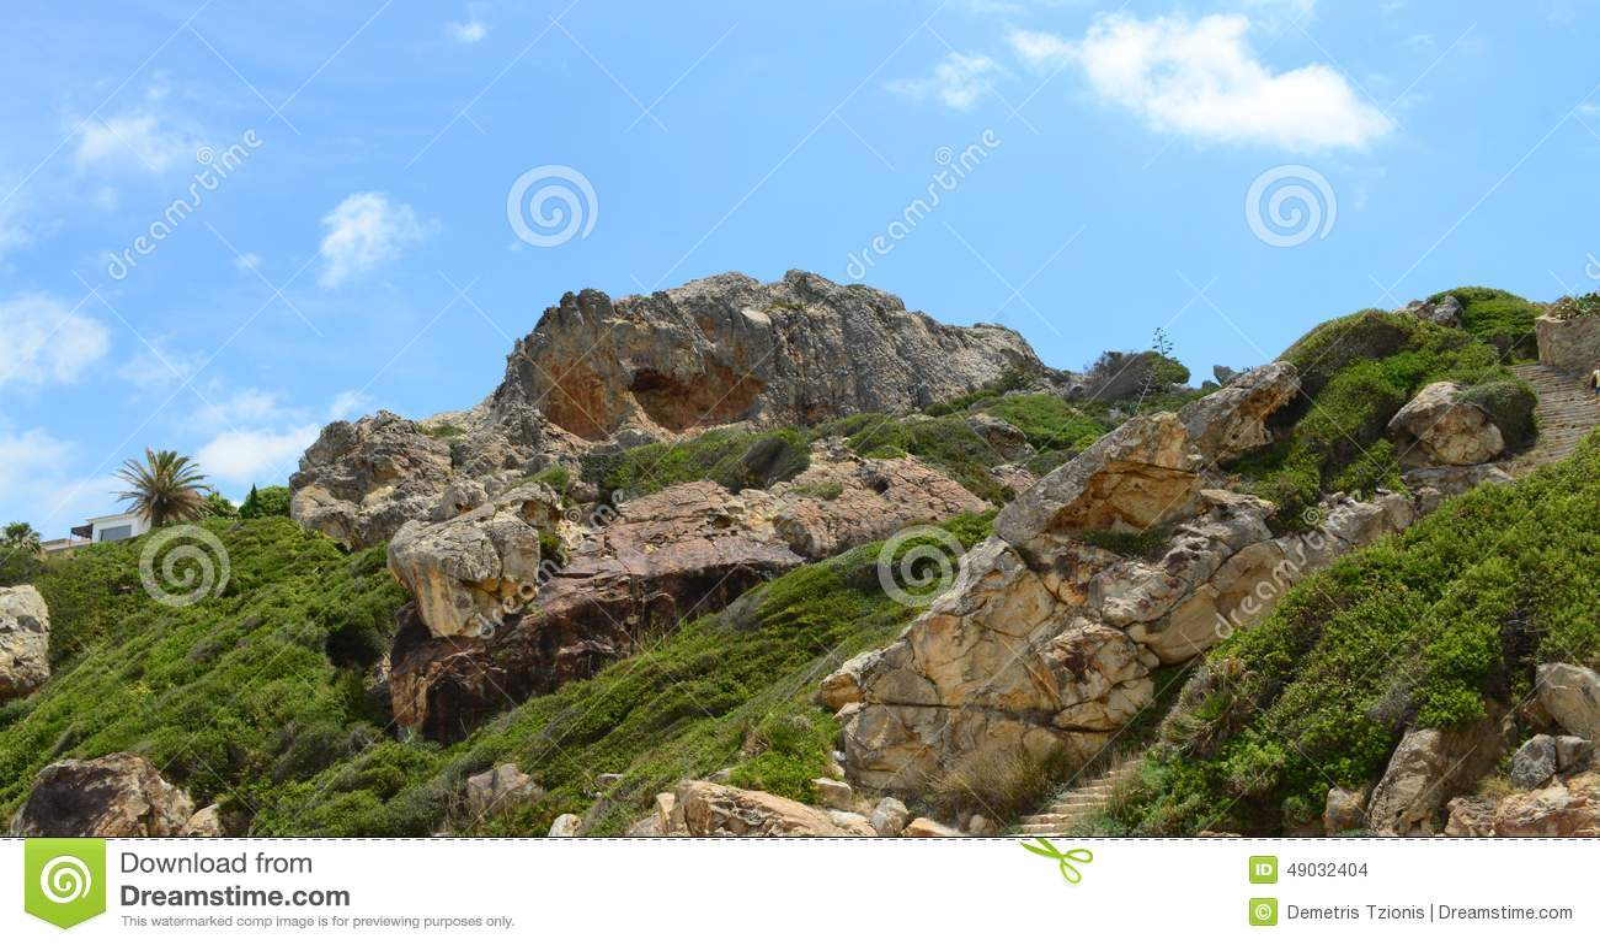 Monte espanhol perto da praia